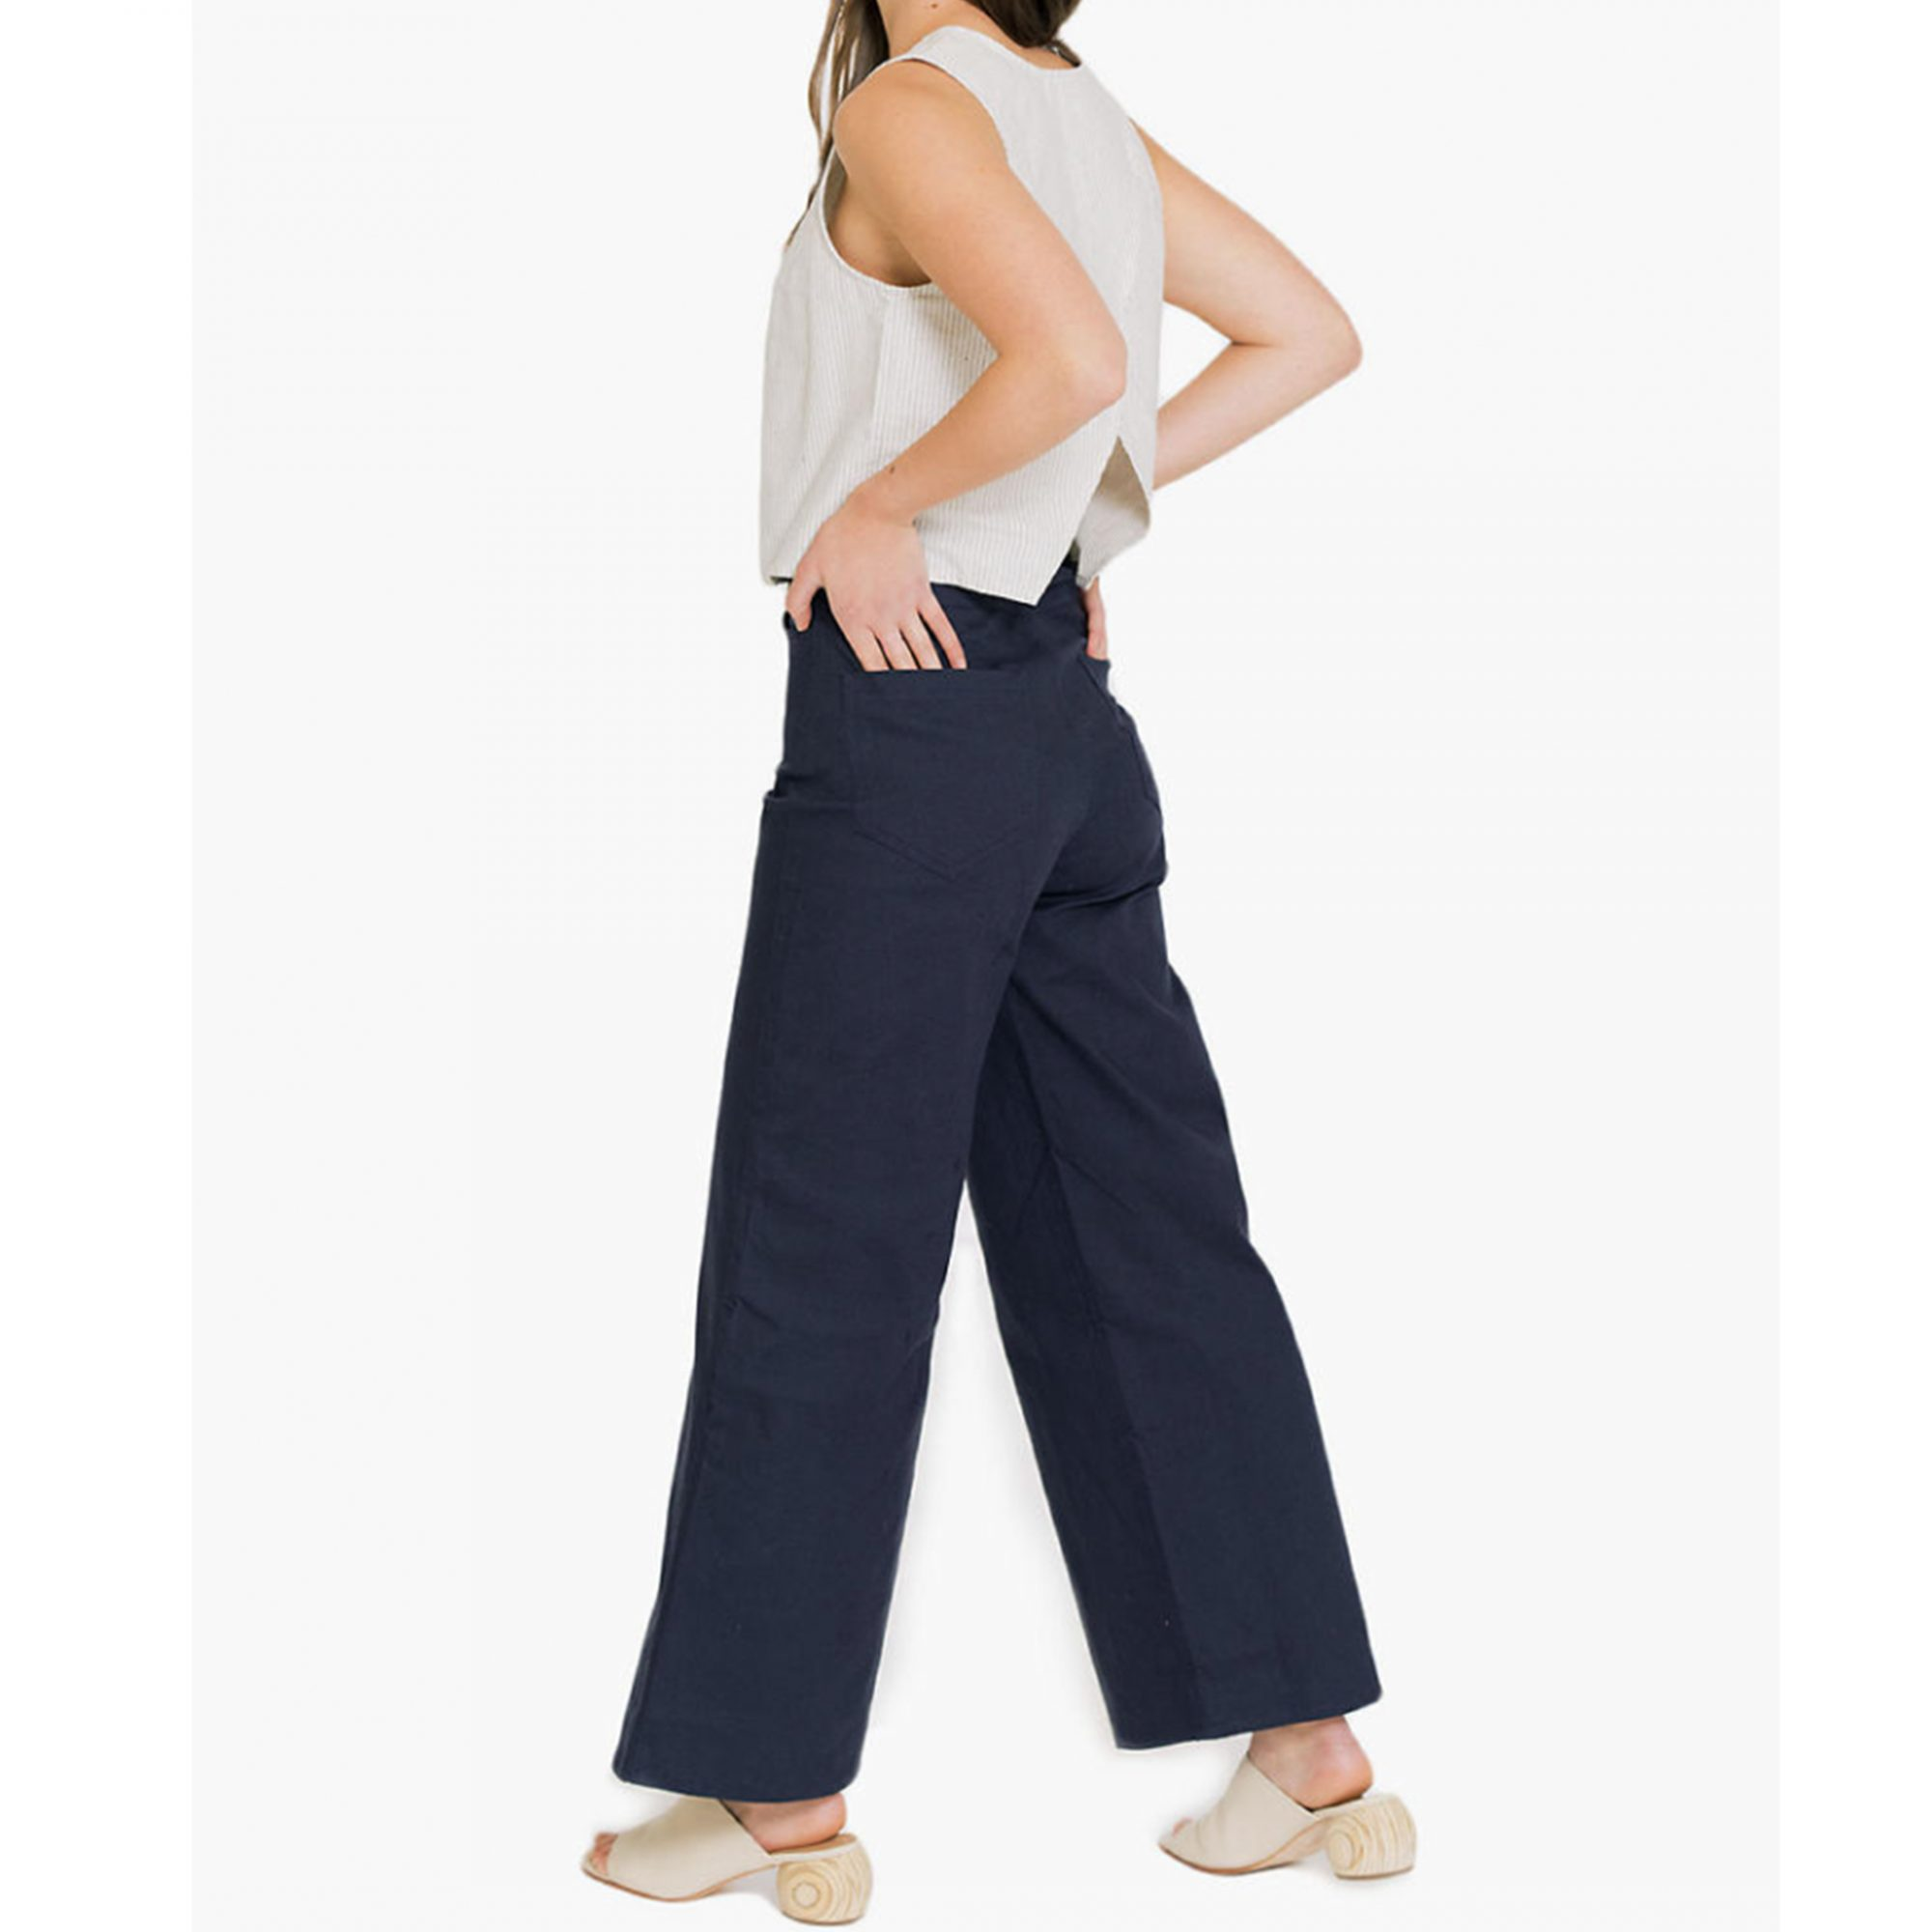 madewell-wide-leg-pants